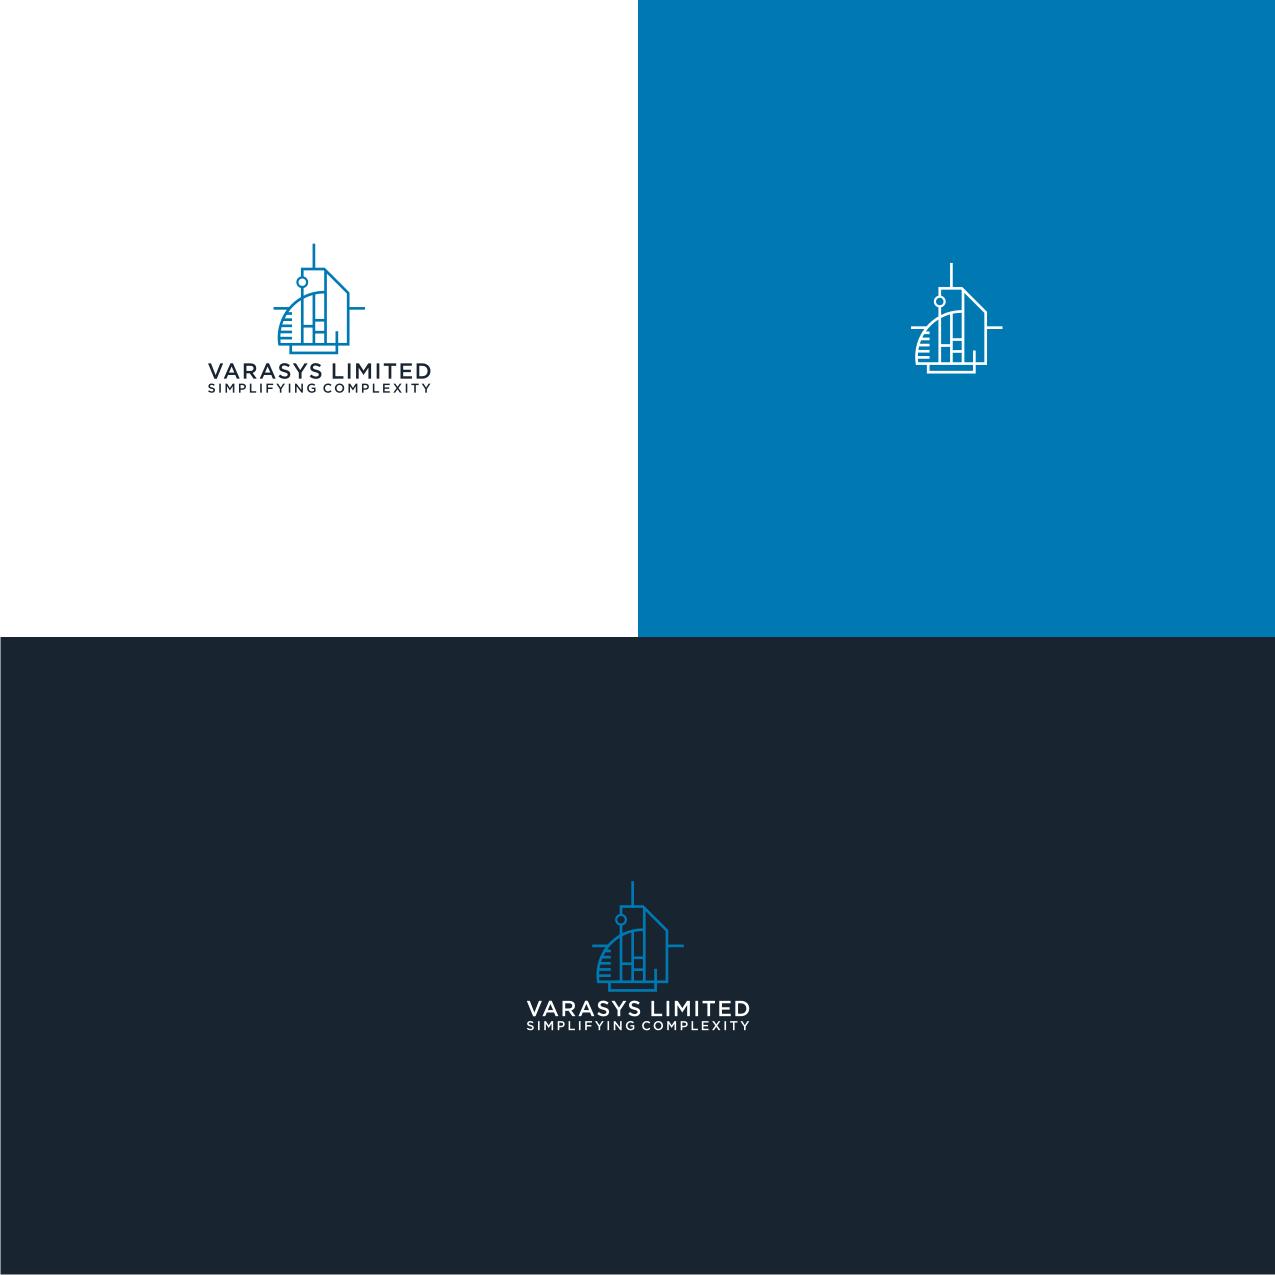 Logo Design by Sofi Ya - Entry No. 92 in the Logo Design Contest Artistic Logo Design for VARASYS Limited.